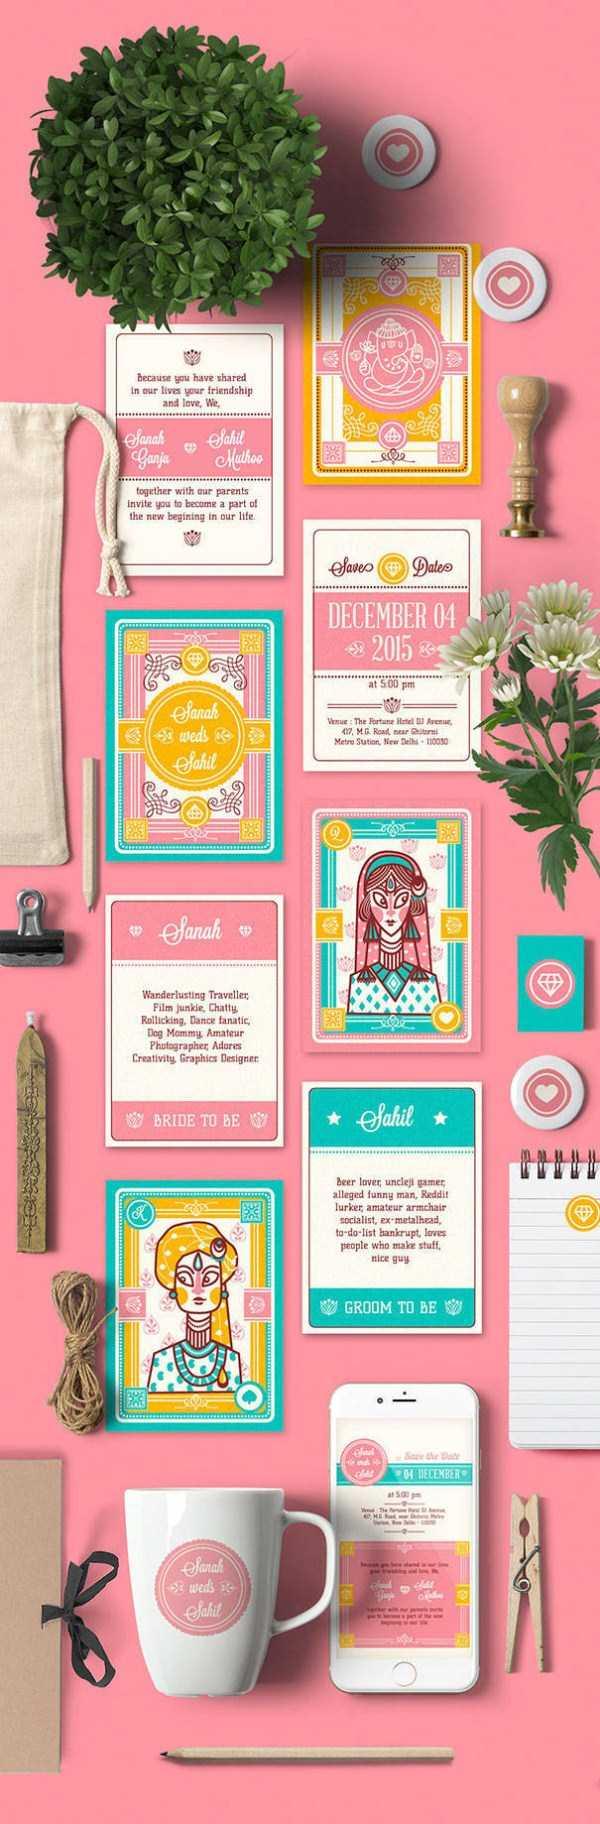 creative-wedding-invitations (60)